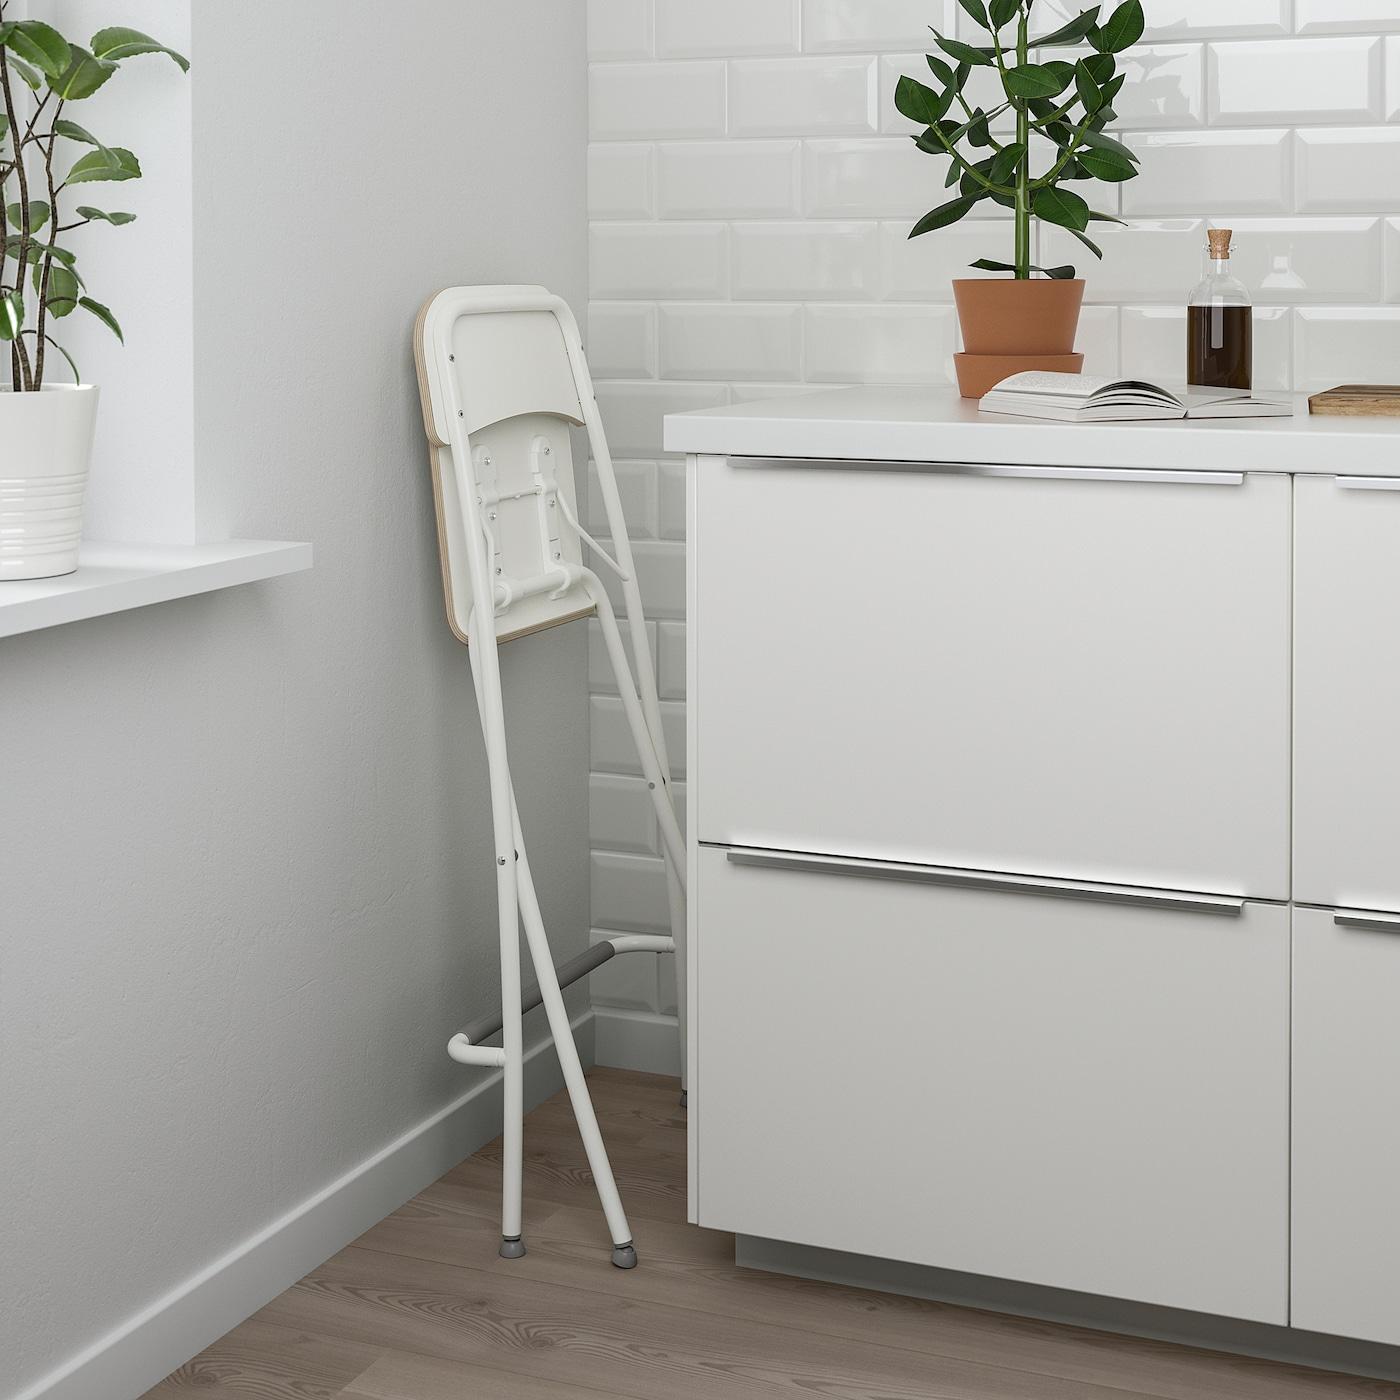 FRANKLIN Bar stool with backrest, foldable - white/white 8 cm